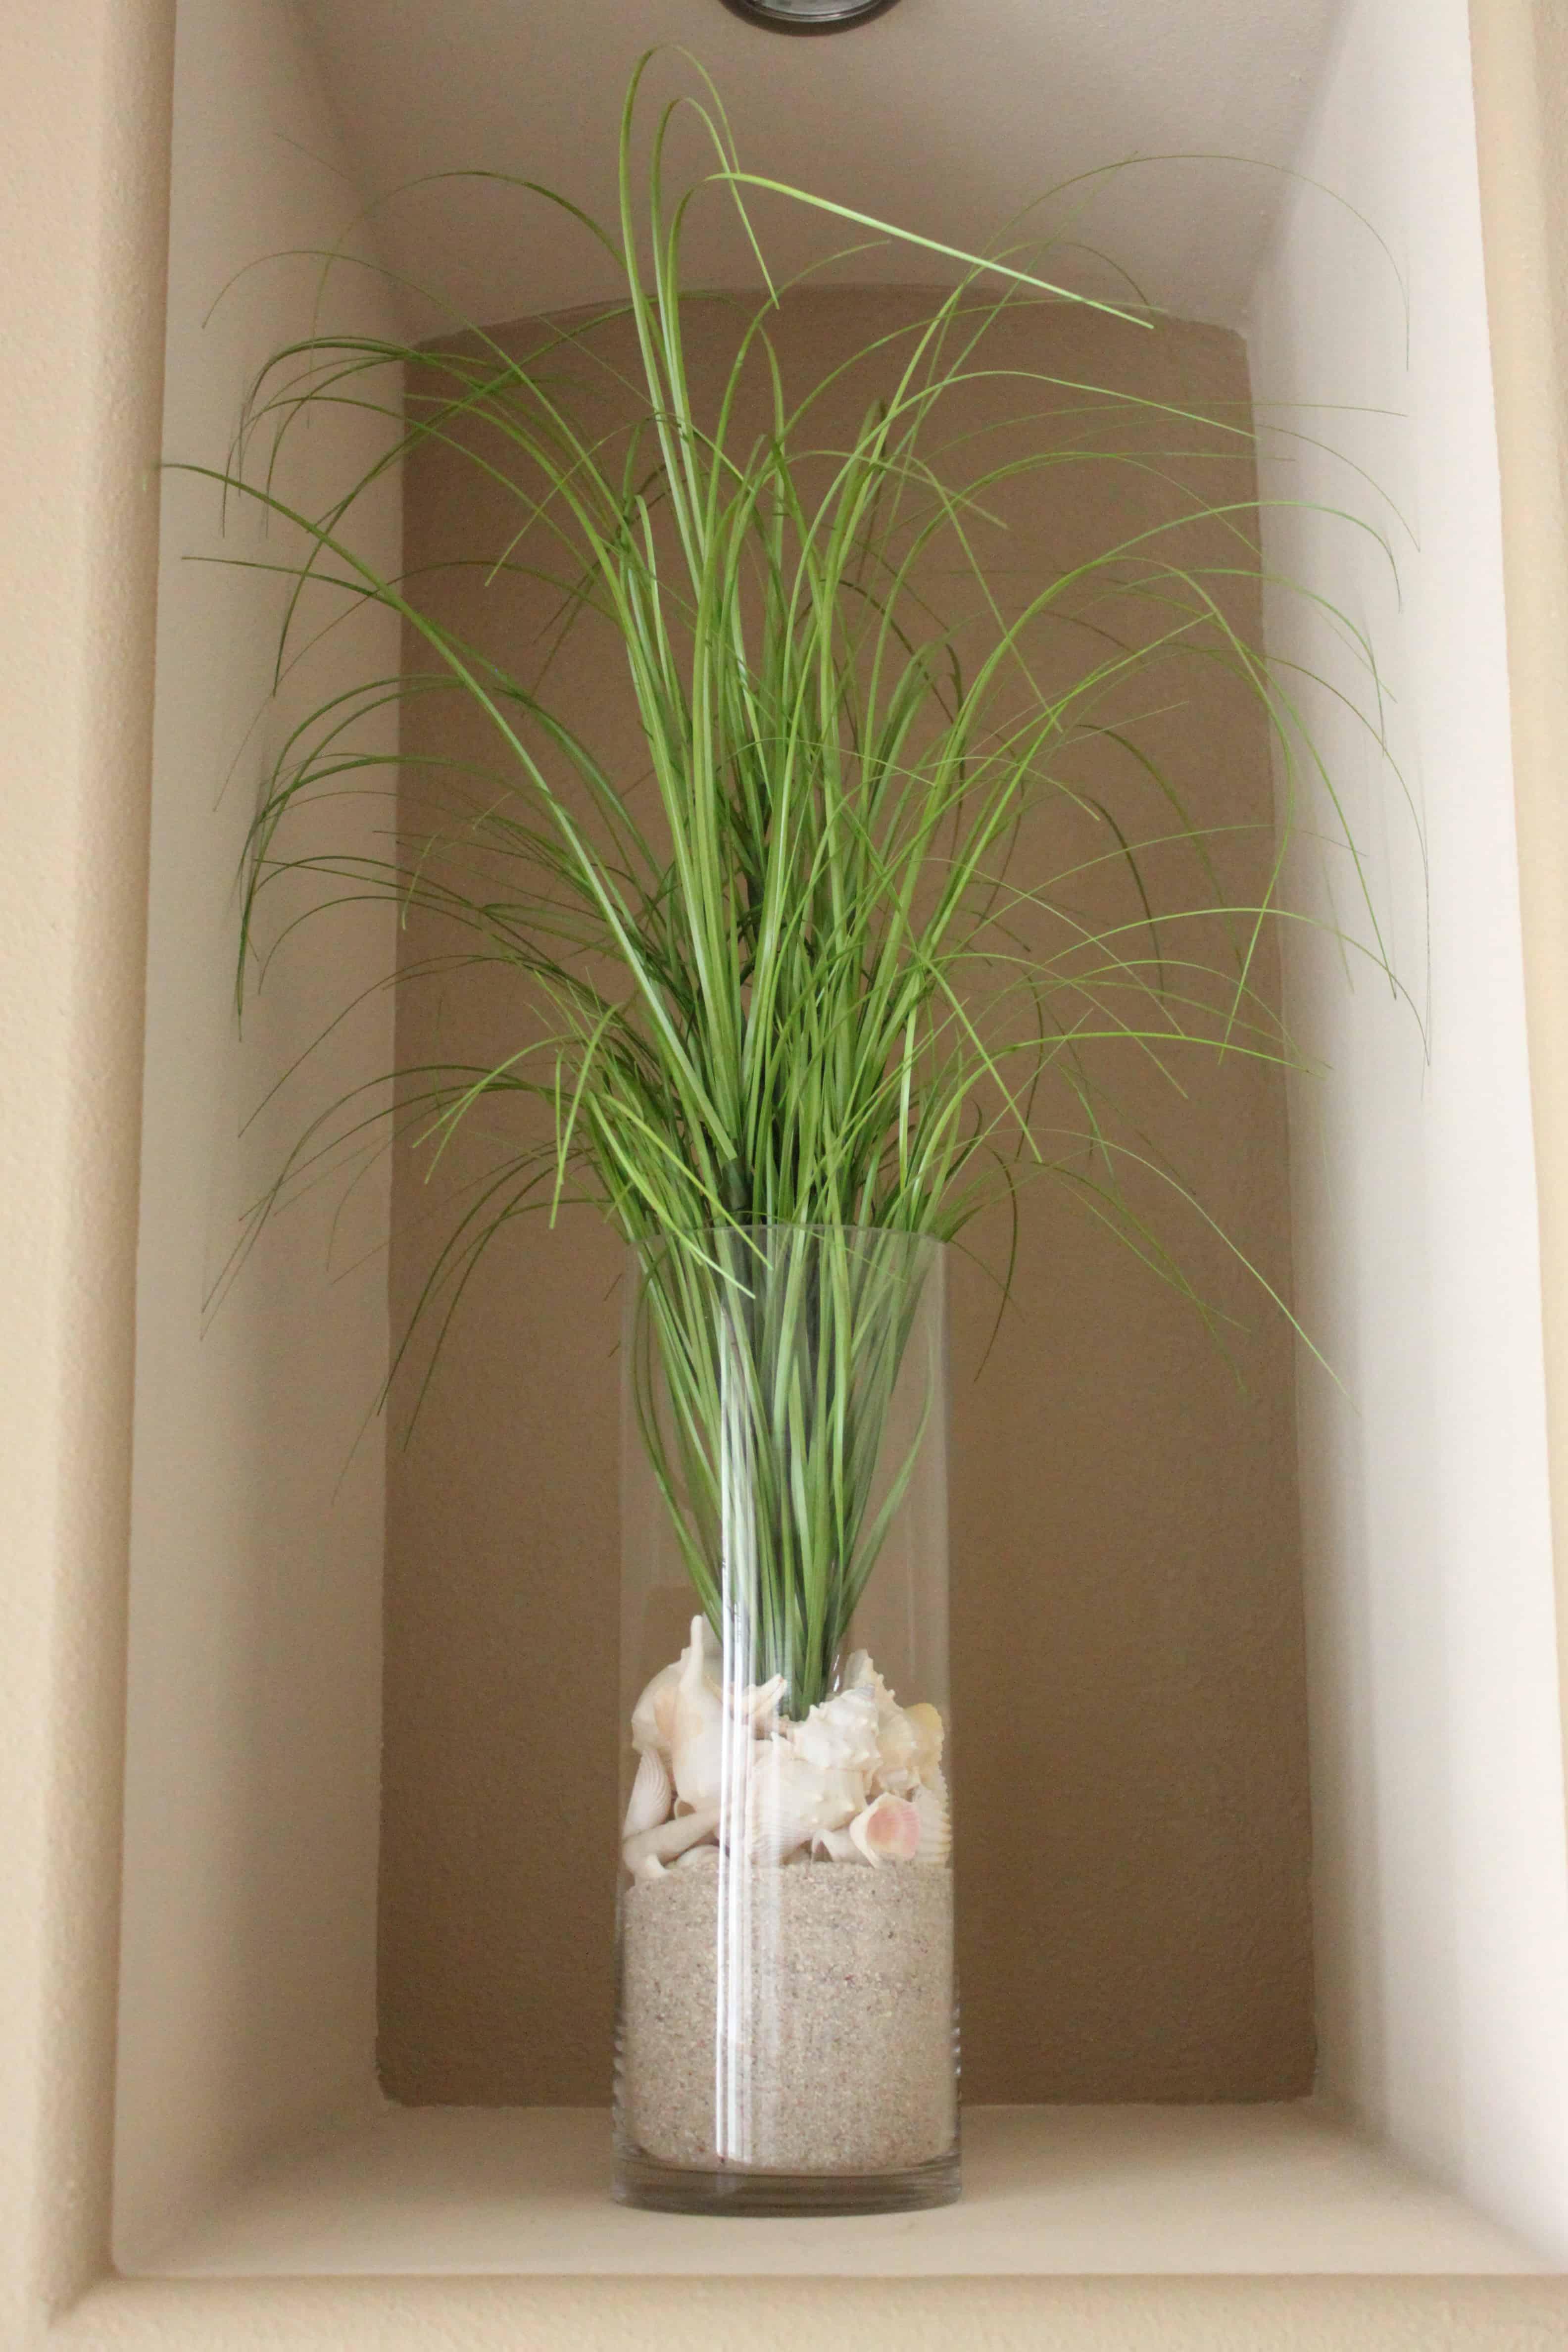 Coastal grass vase